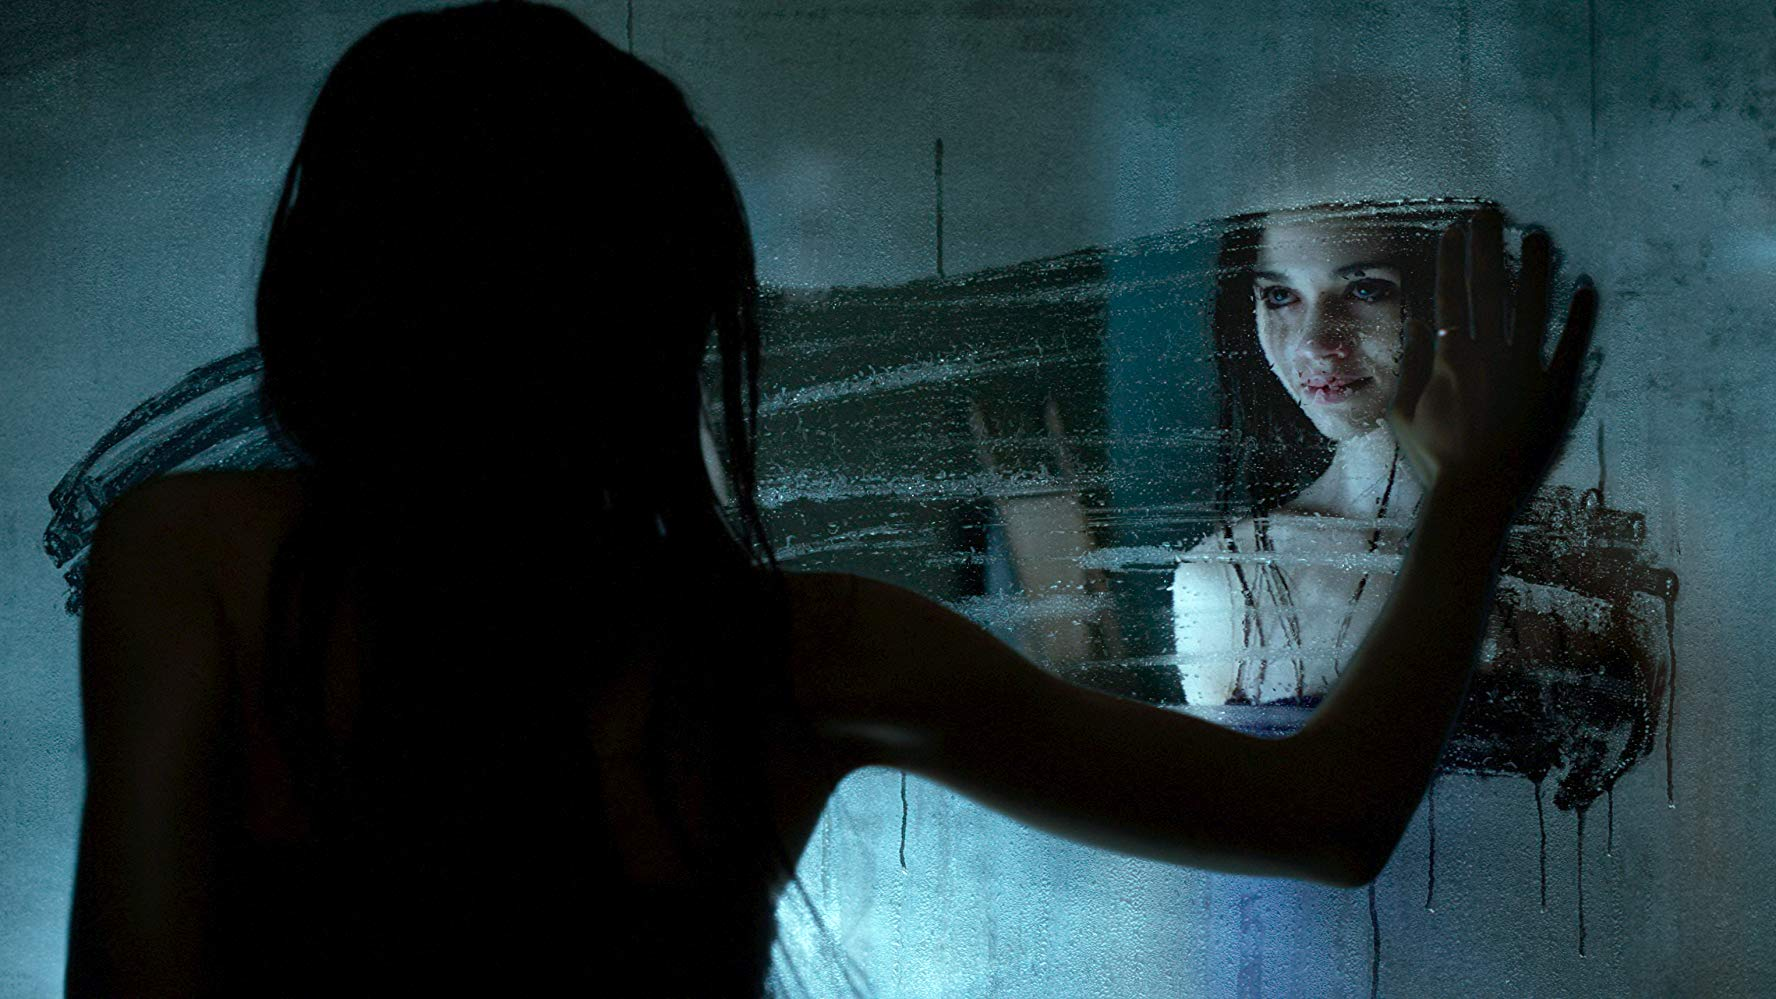 Картинки по запросу «Темное зеркало»